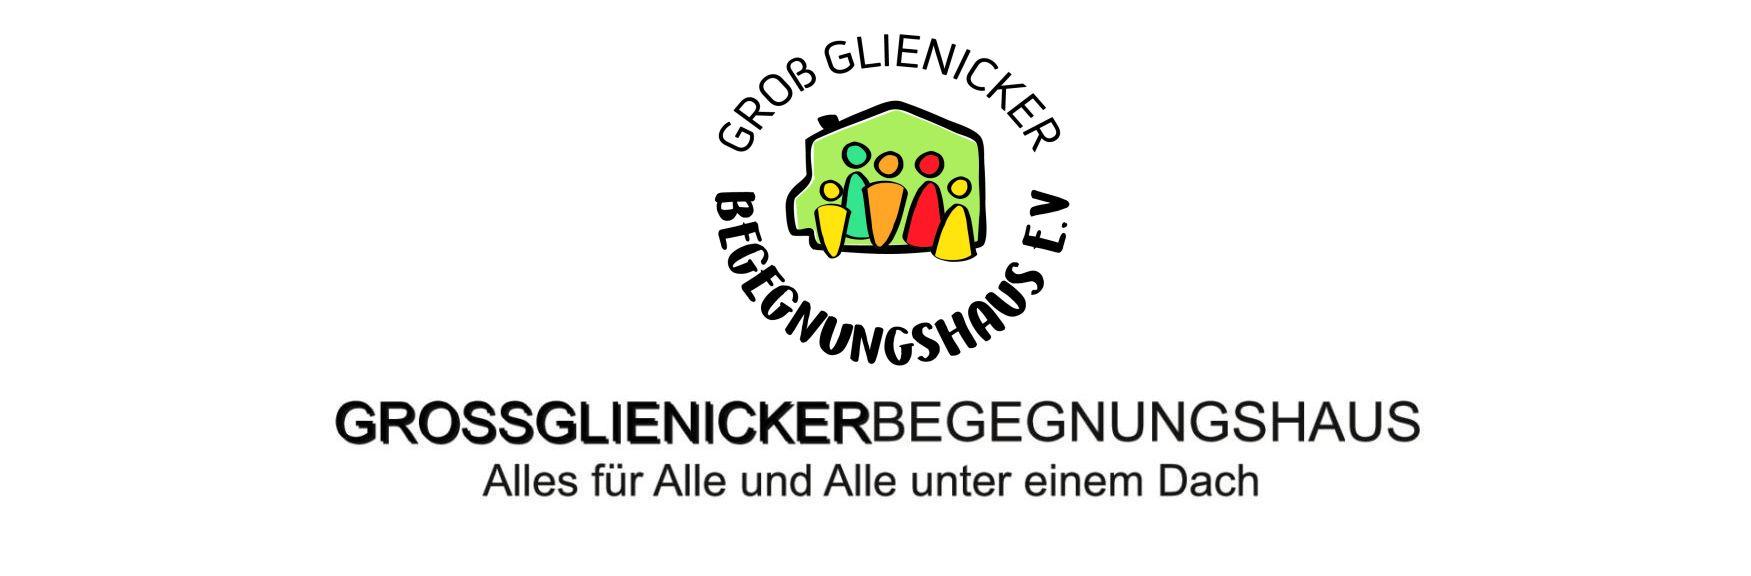 Groß Glienicker Begegnungshaus e.V.